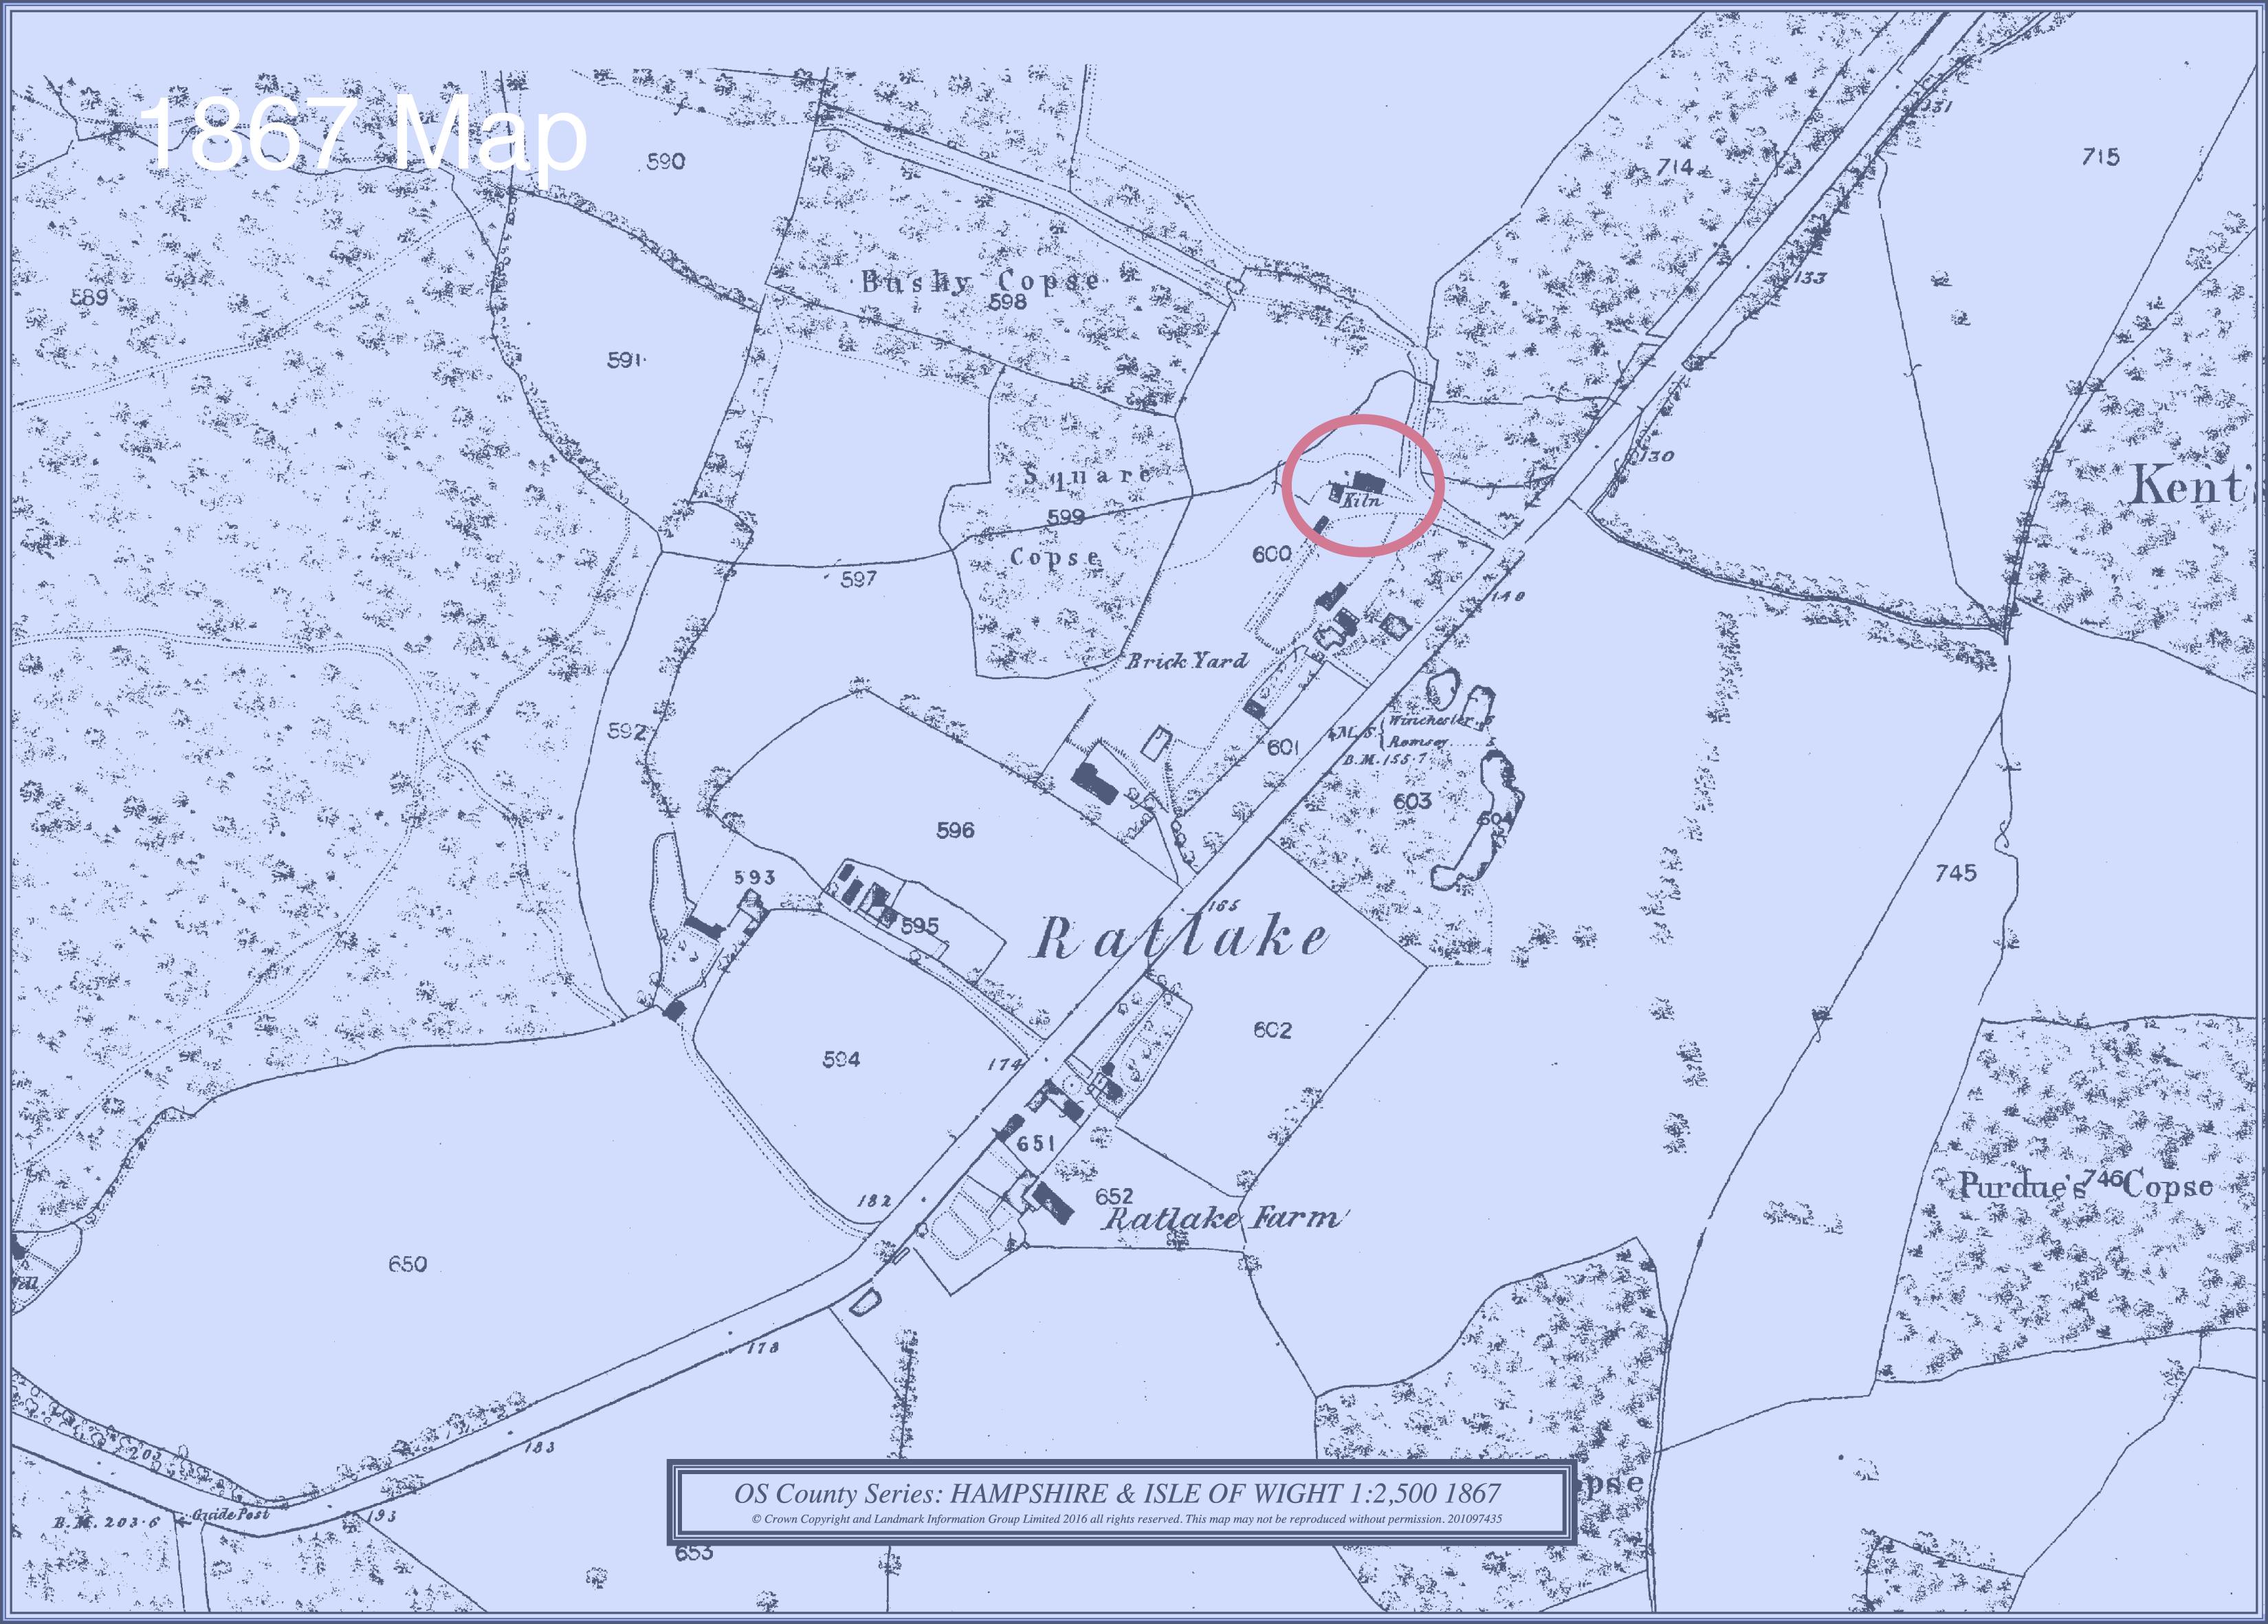 ratlake-map-1867-annotation-blue